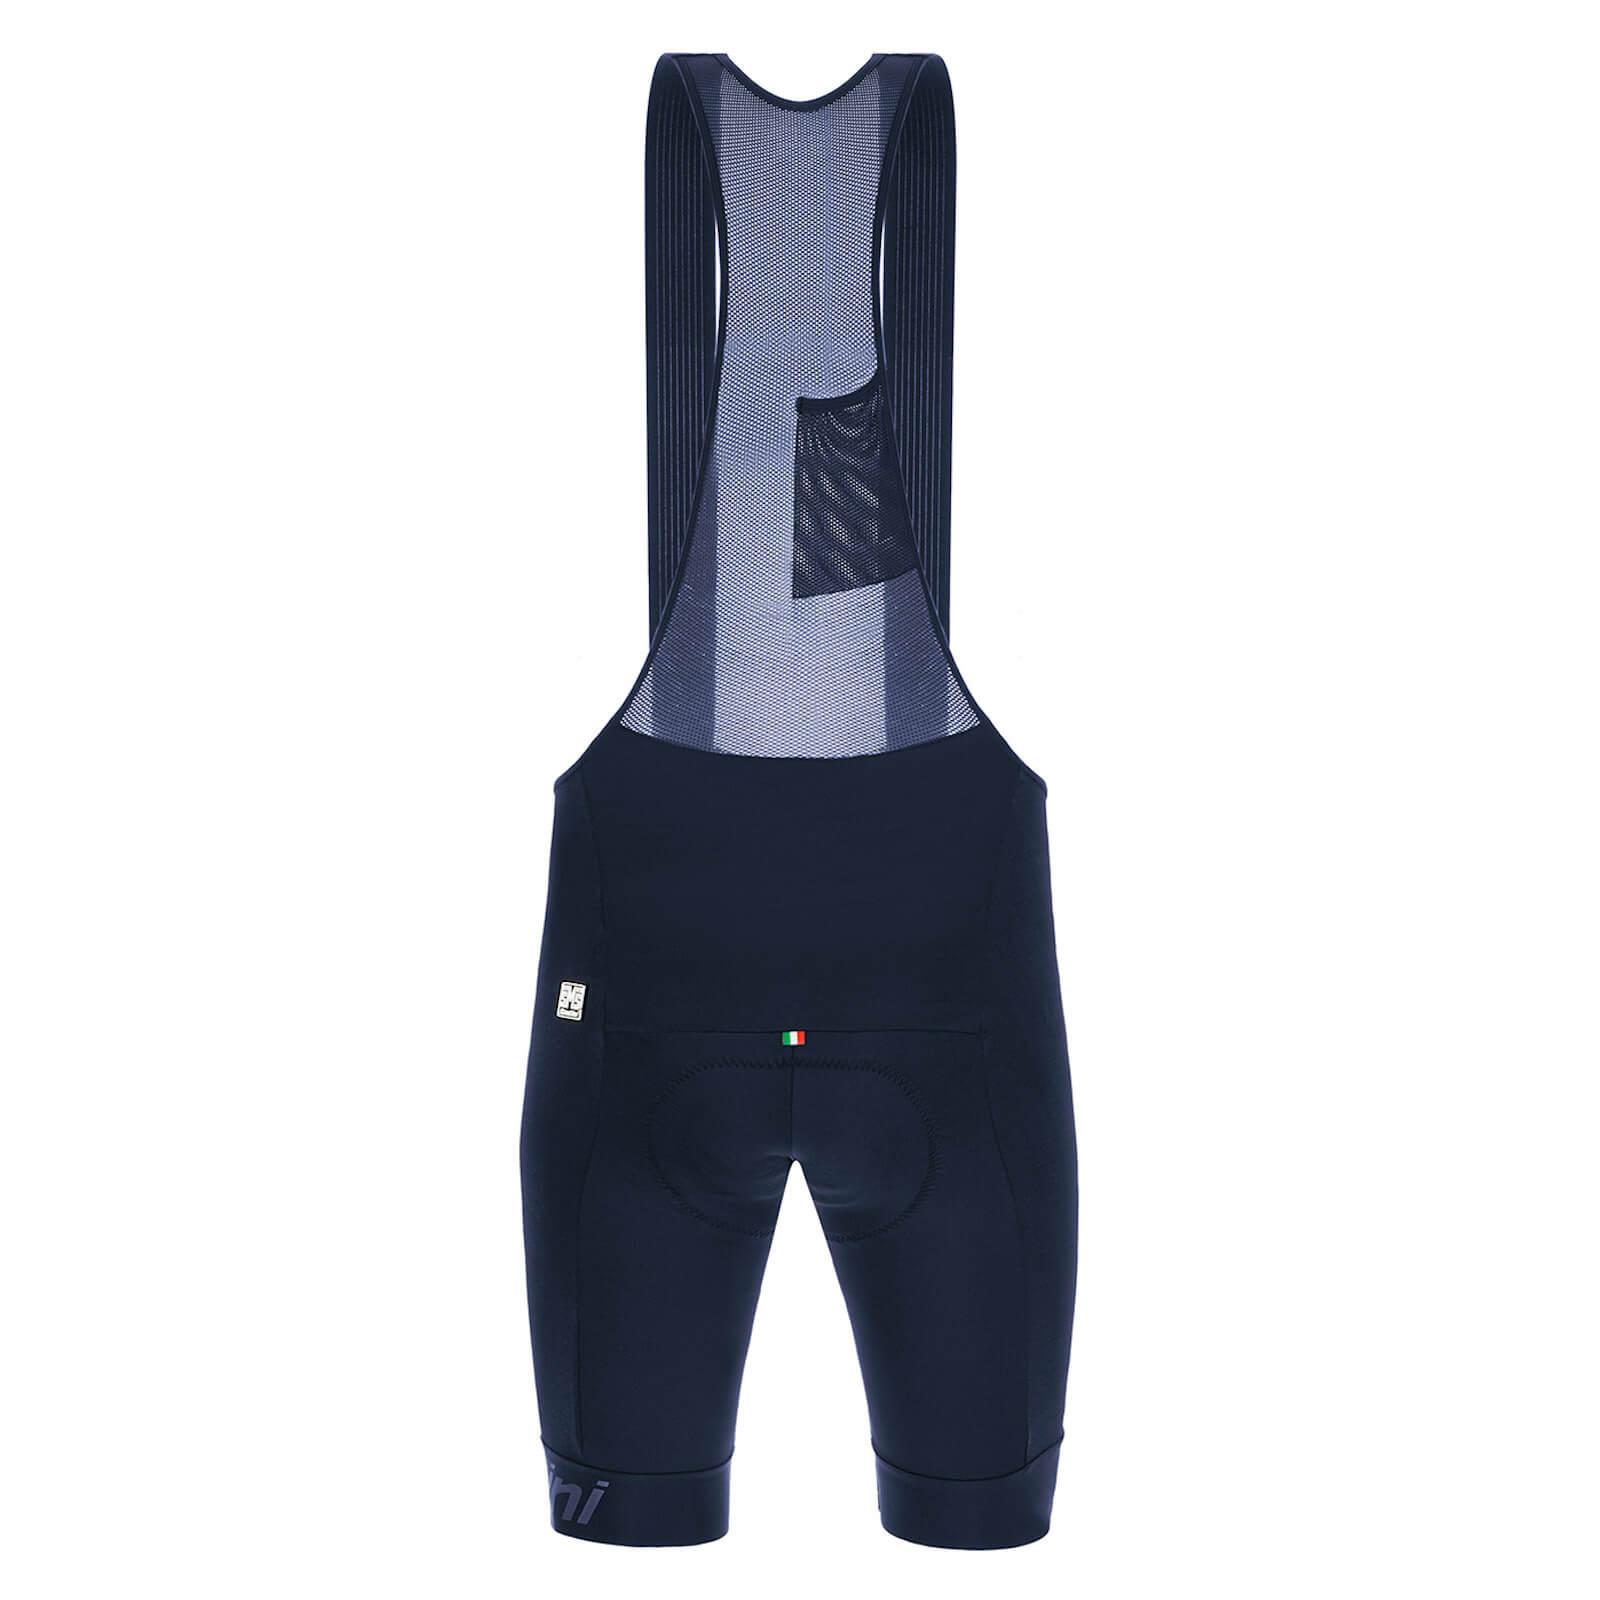 Santini Impact Pro Bib Shorts - XL - Nautica Blue